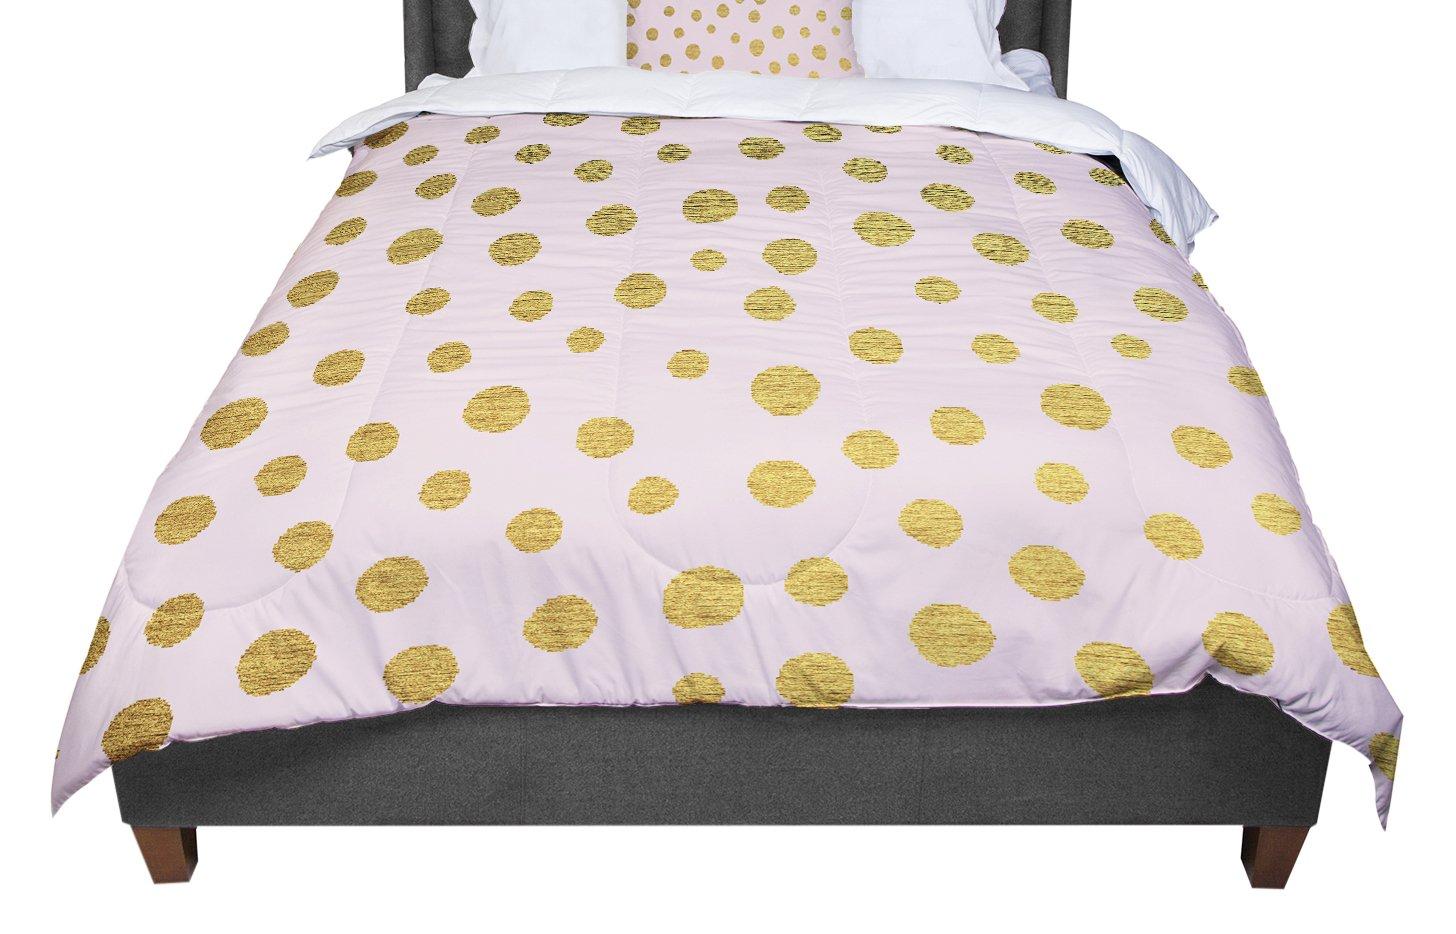 68 X 88 KESS InHouse Nika Martinez Golden Dots /& Pink Blush Twin Comforter